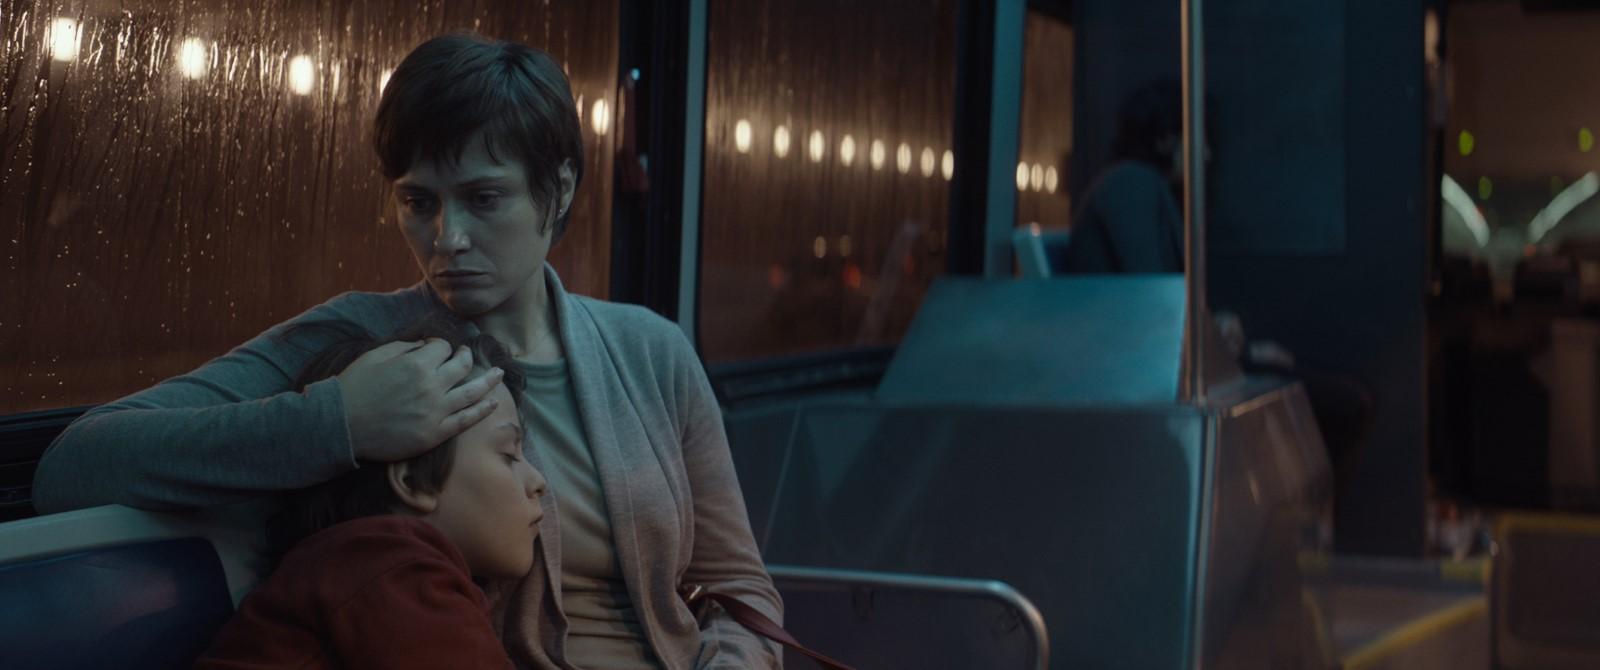 Luna de miere - Lemonade (2018) Online Subtitrat in Romana